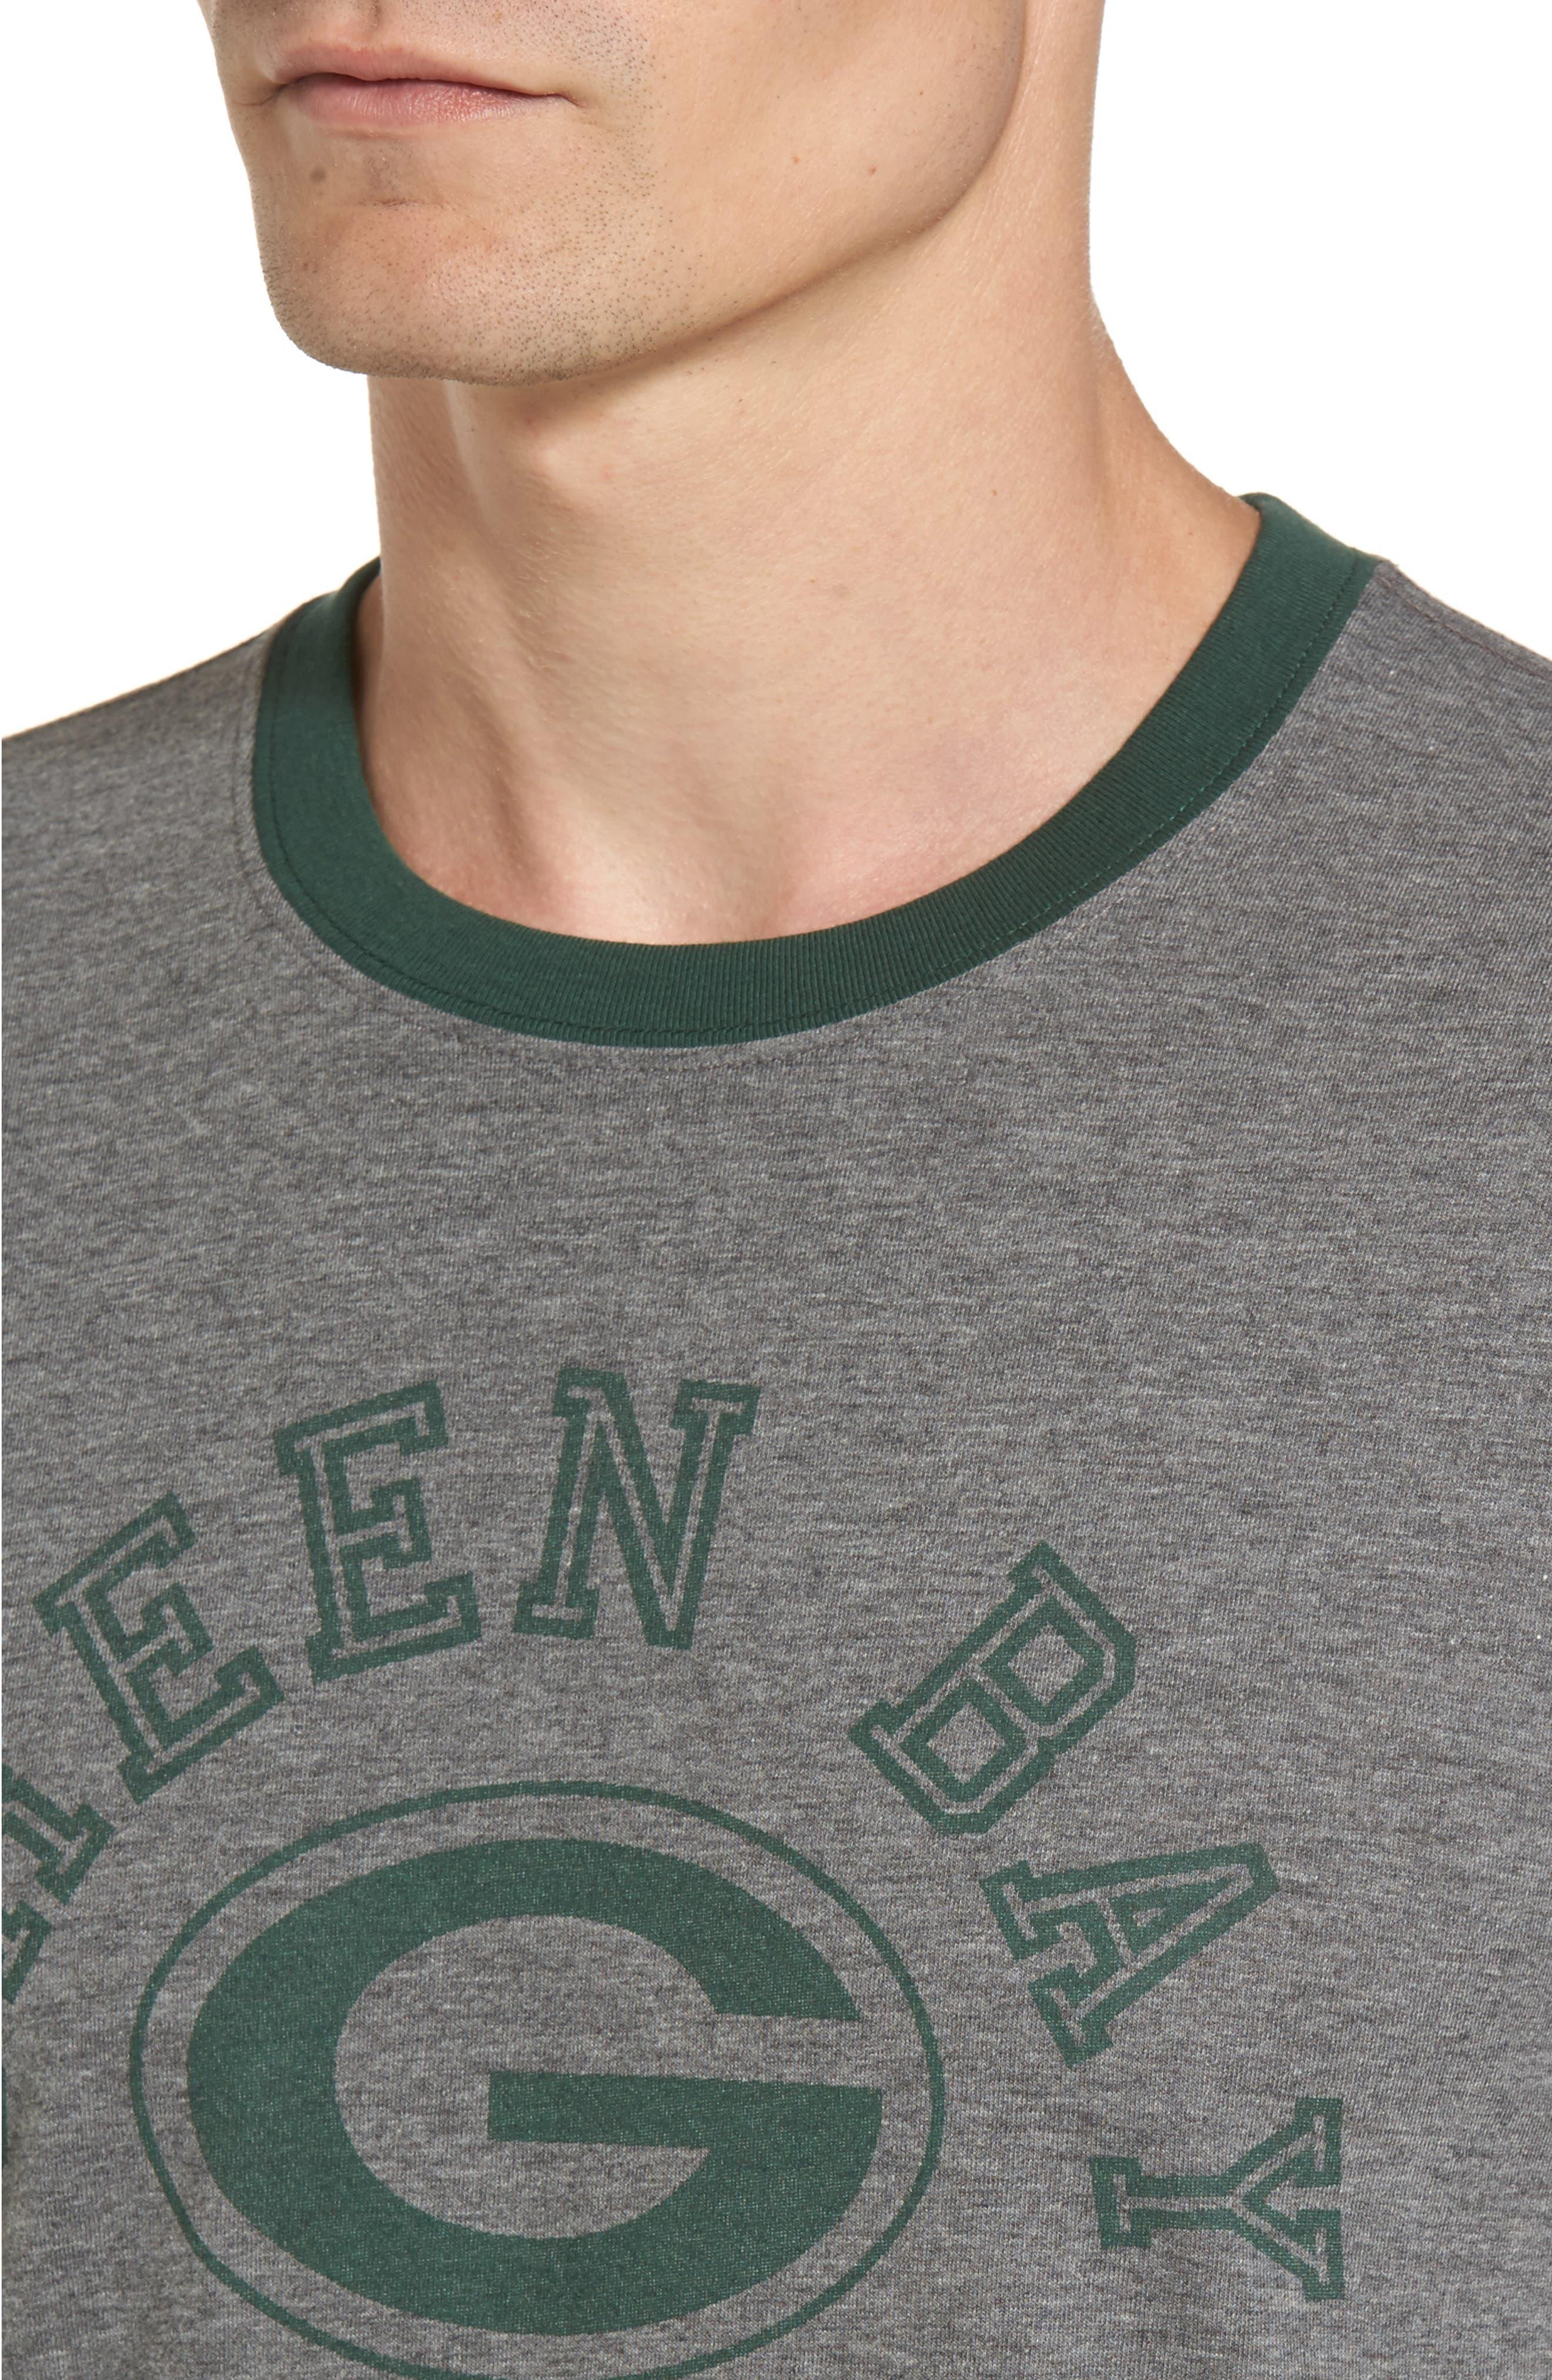 Green Bay Packers Ringer T-Shirt,                             Alternate thumbnail 4, color,                             021